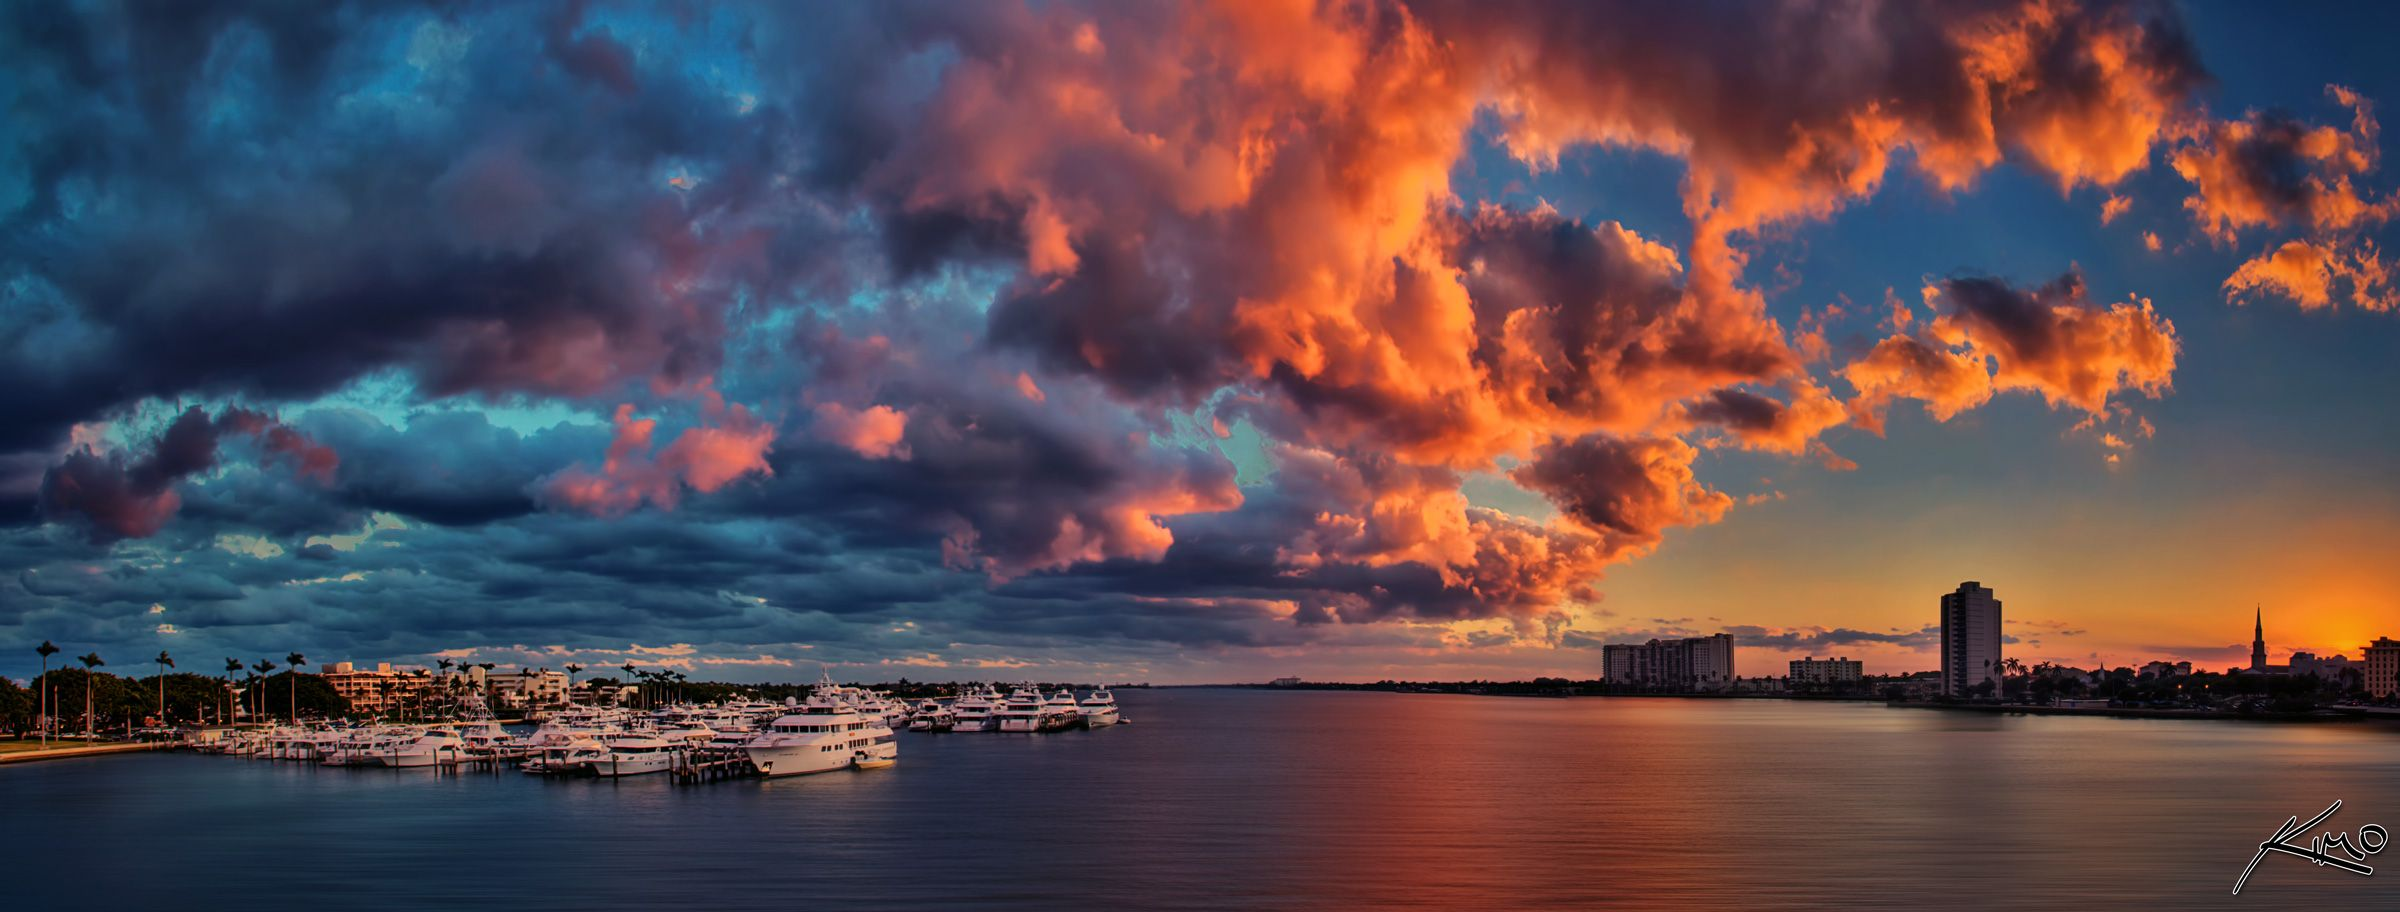 south florida pinterest west palm beach